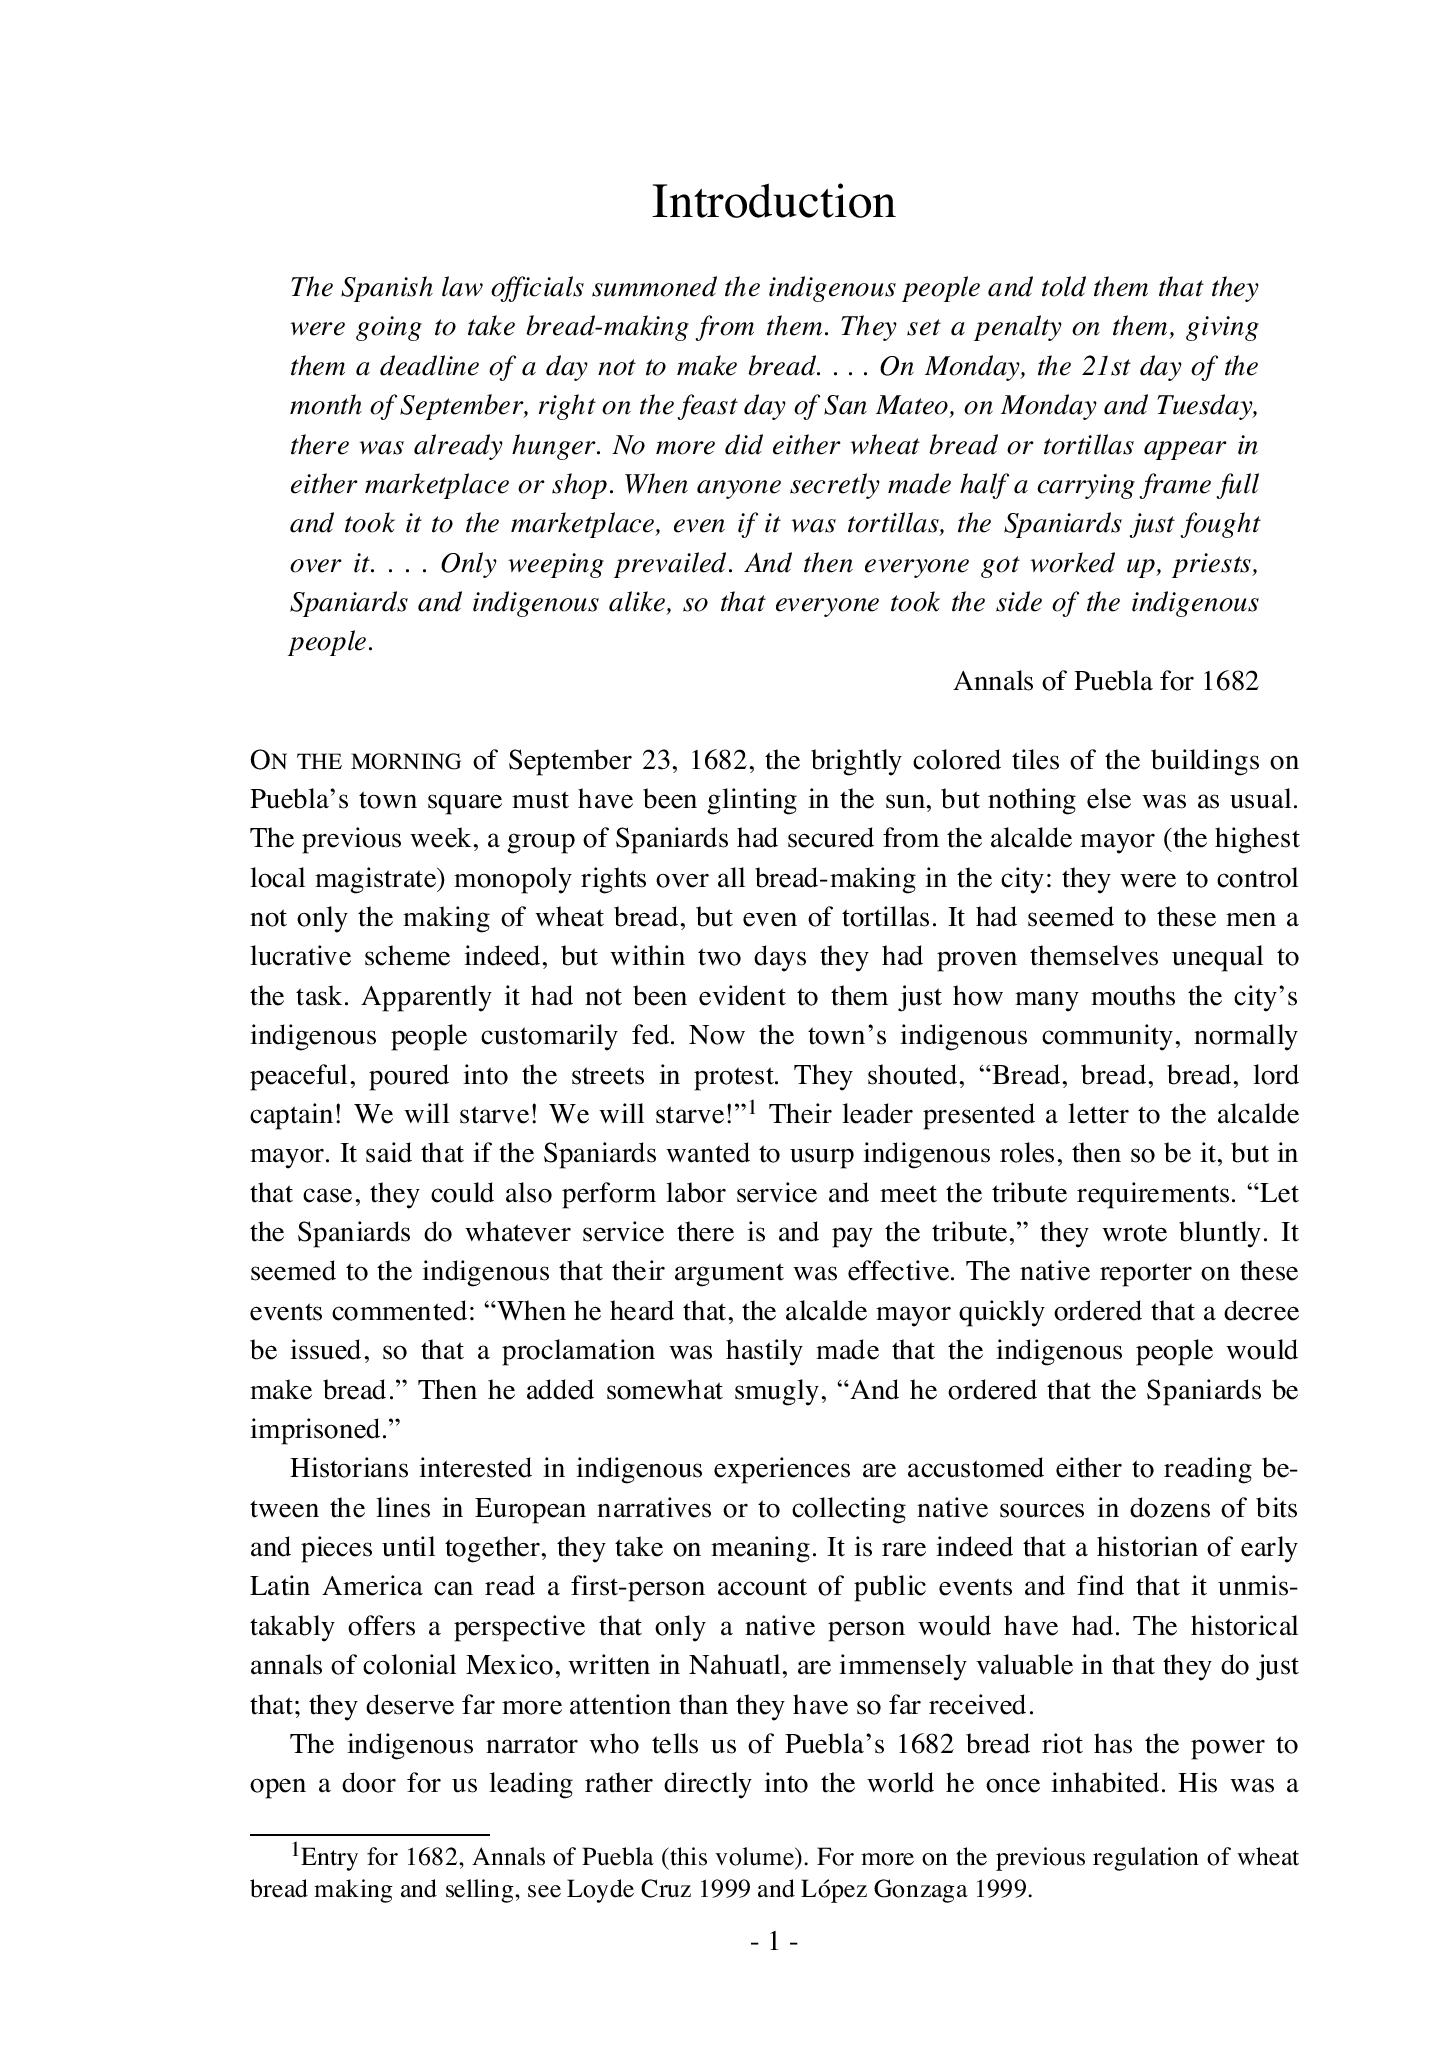 Examples List on Excerpt